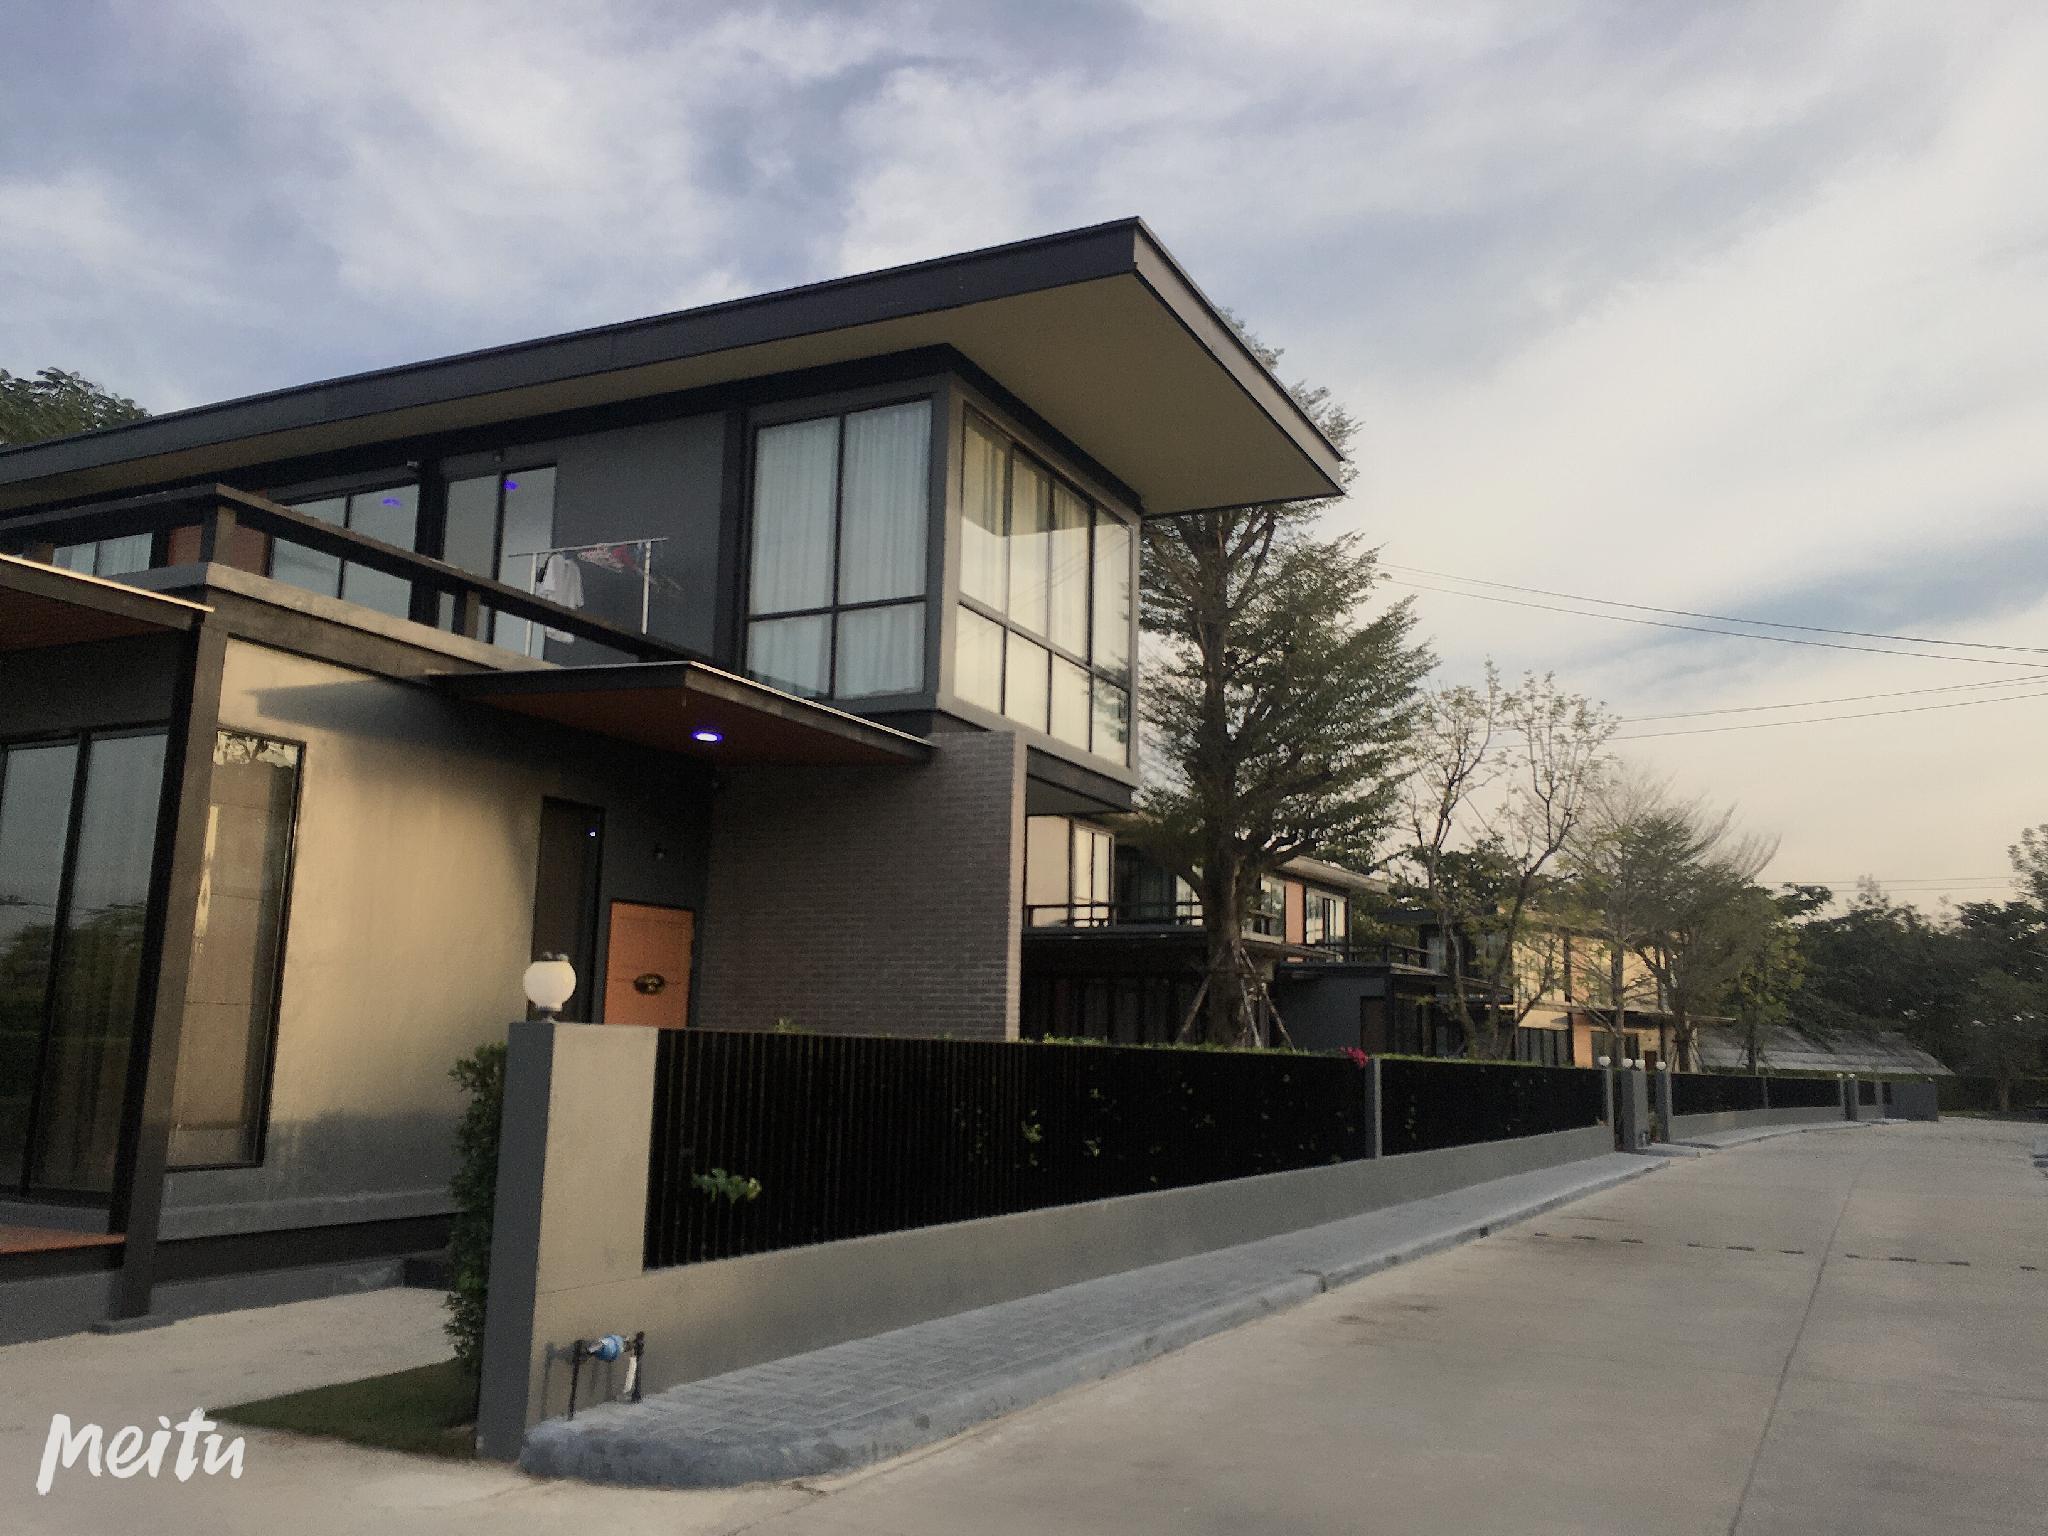 Fashion pool villa can be home party cooking วิลลา 3 ห้องนอน 4 ห้องน้ำส่วนตัว ขนาด 180 ตร.ม. – ห้วยใหญ่